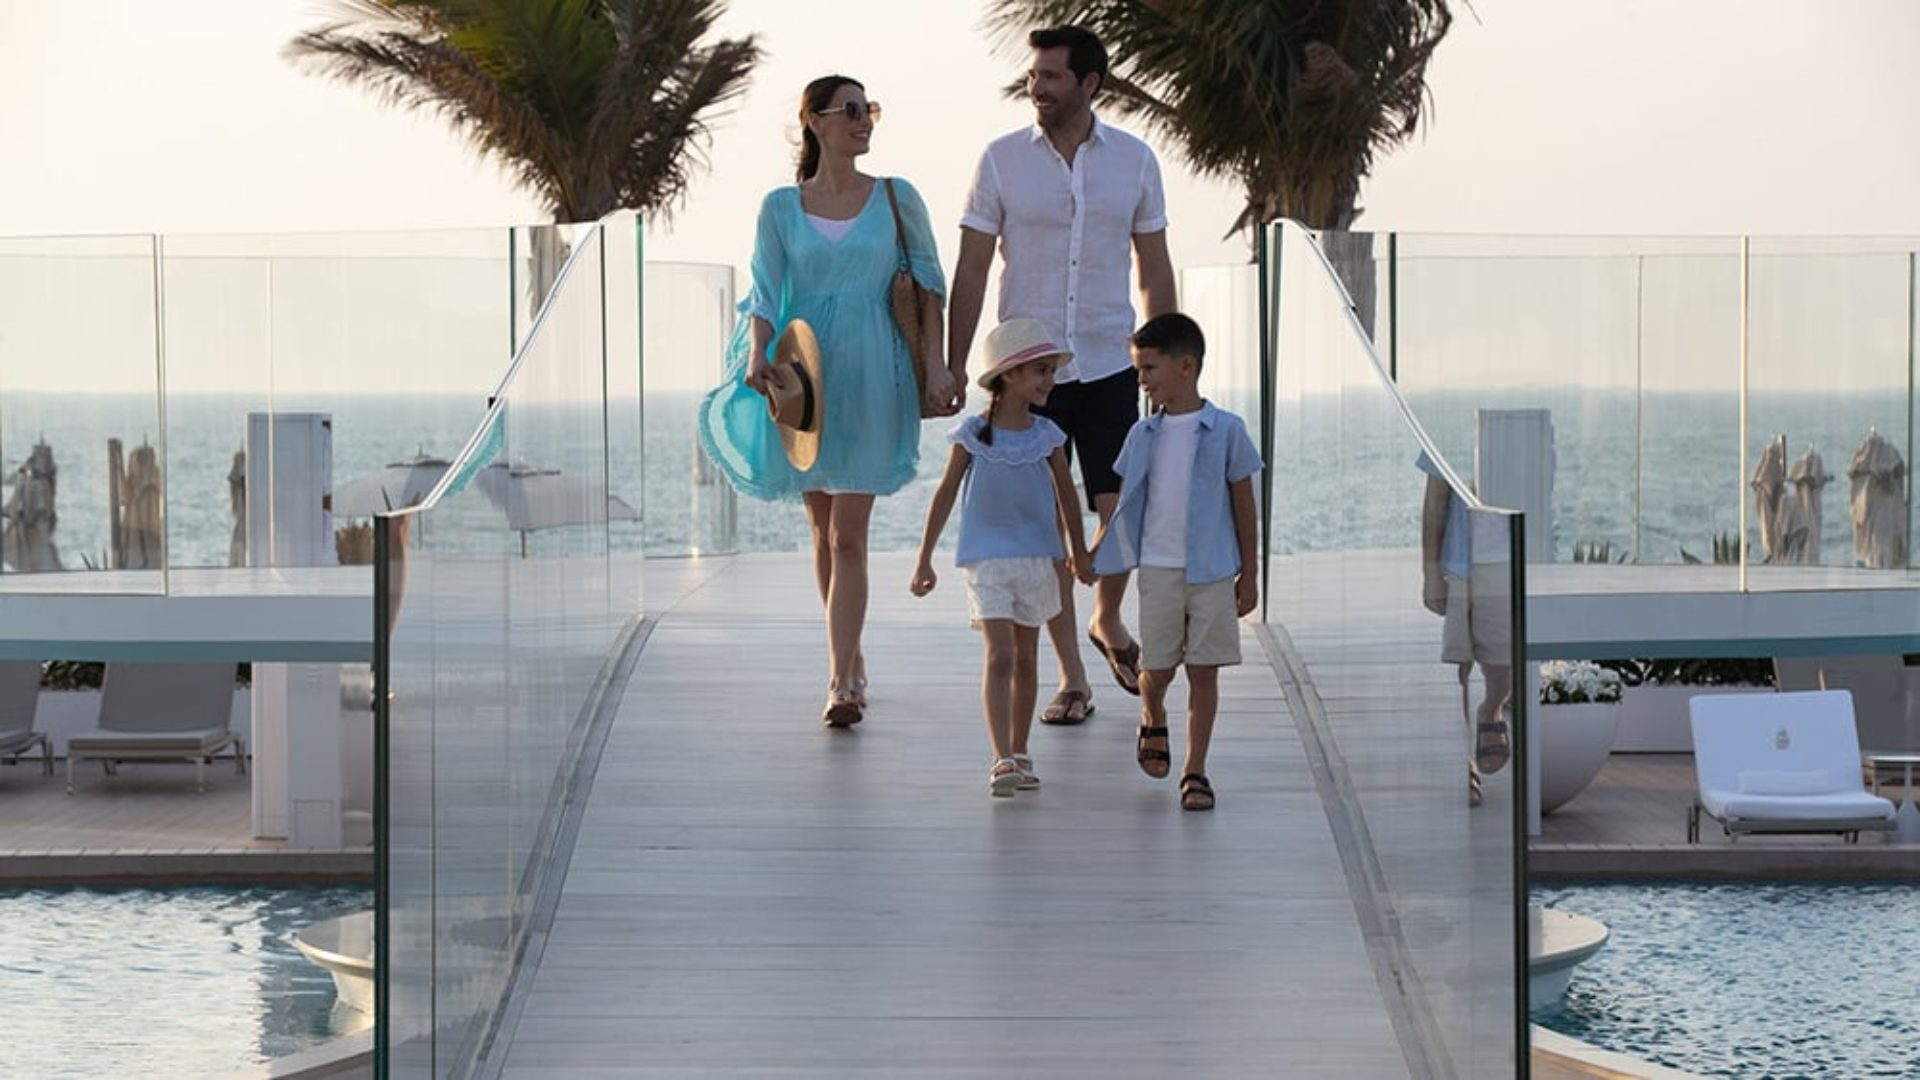 Family crossing the bridge on the pool terrace at the Burj Al Arab